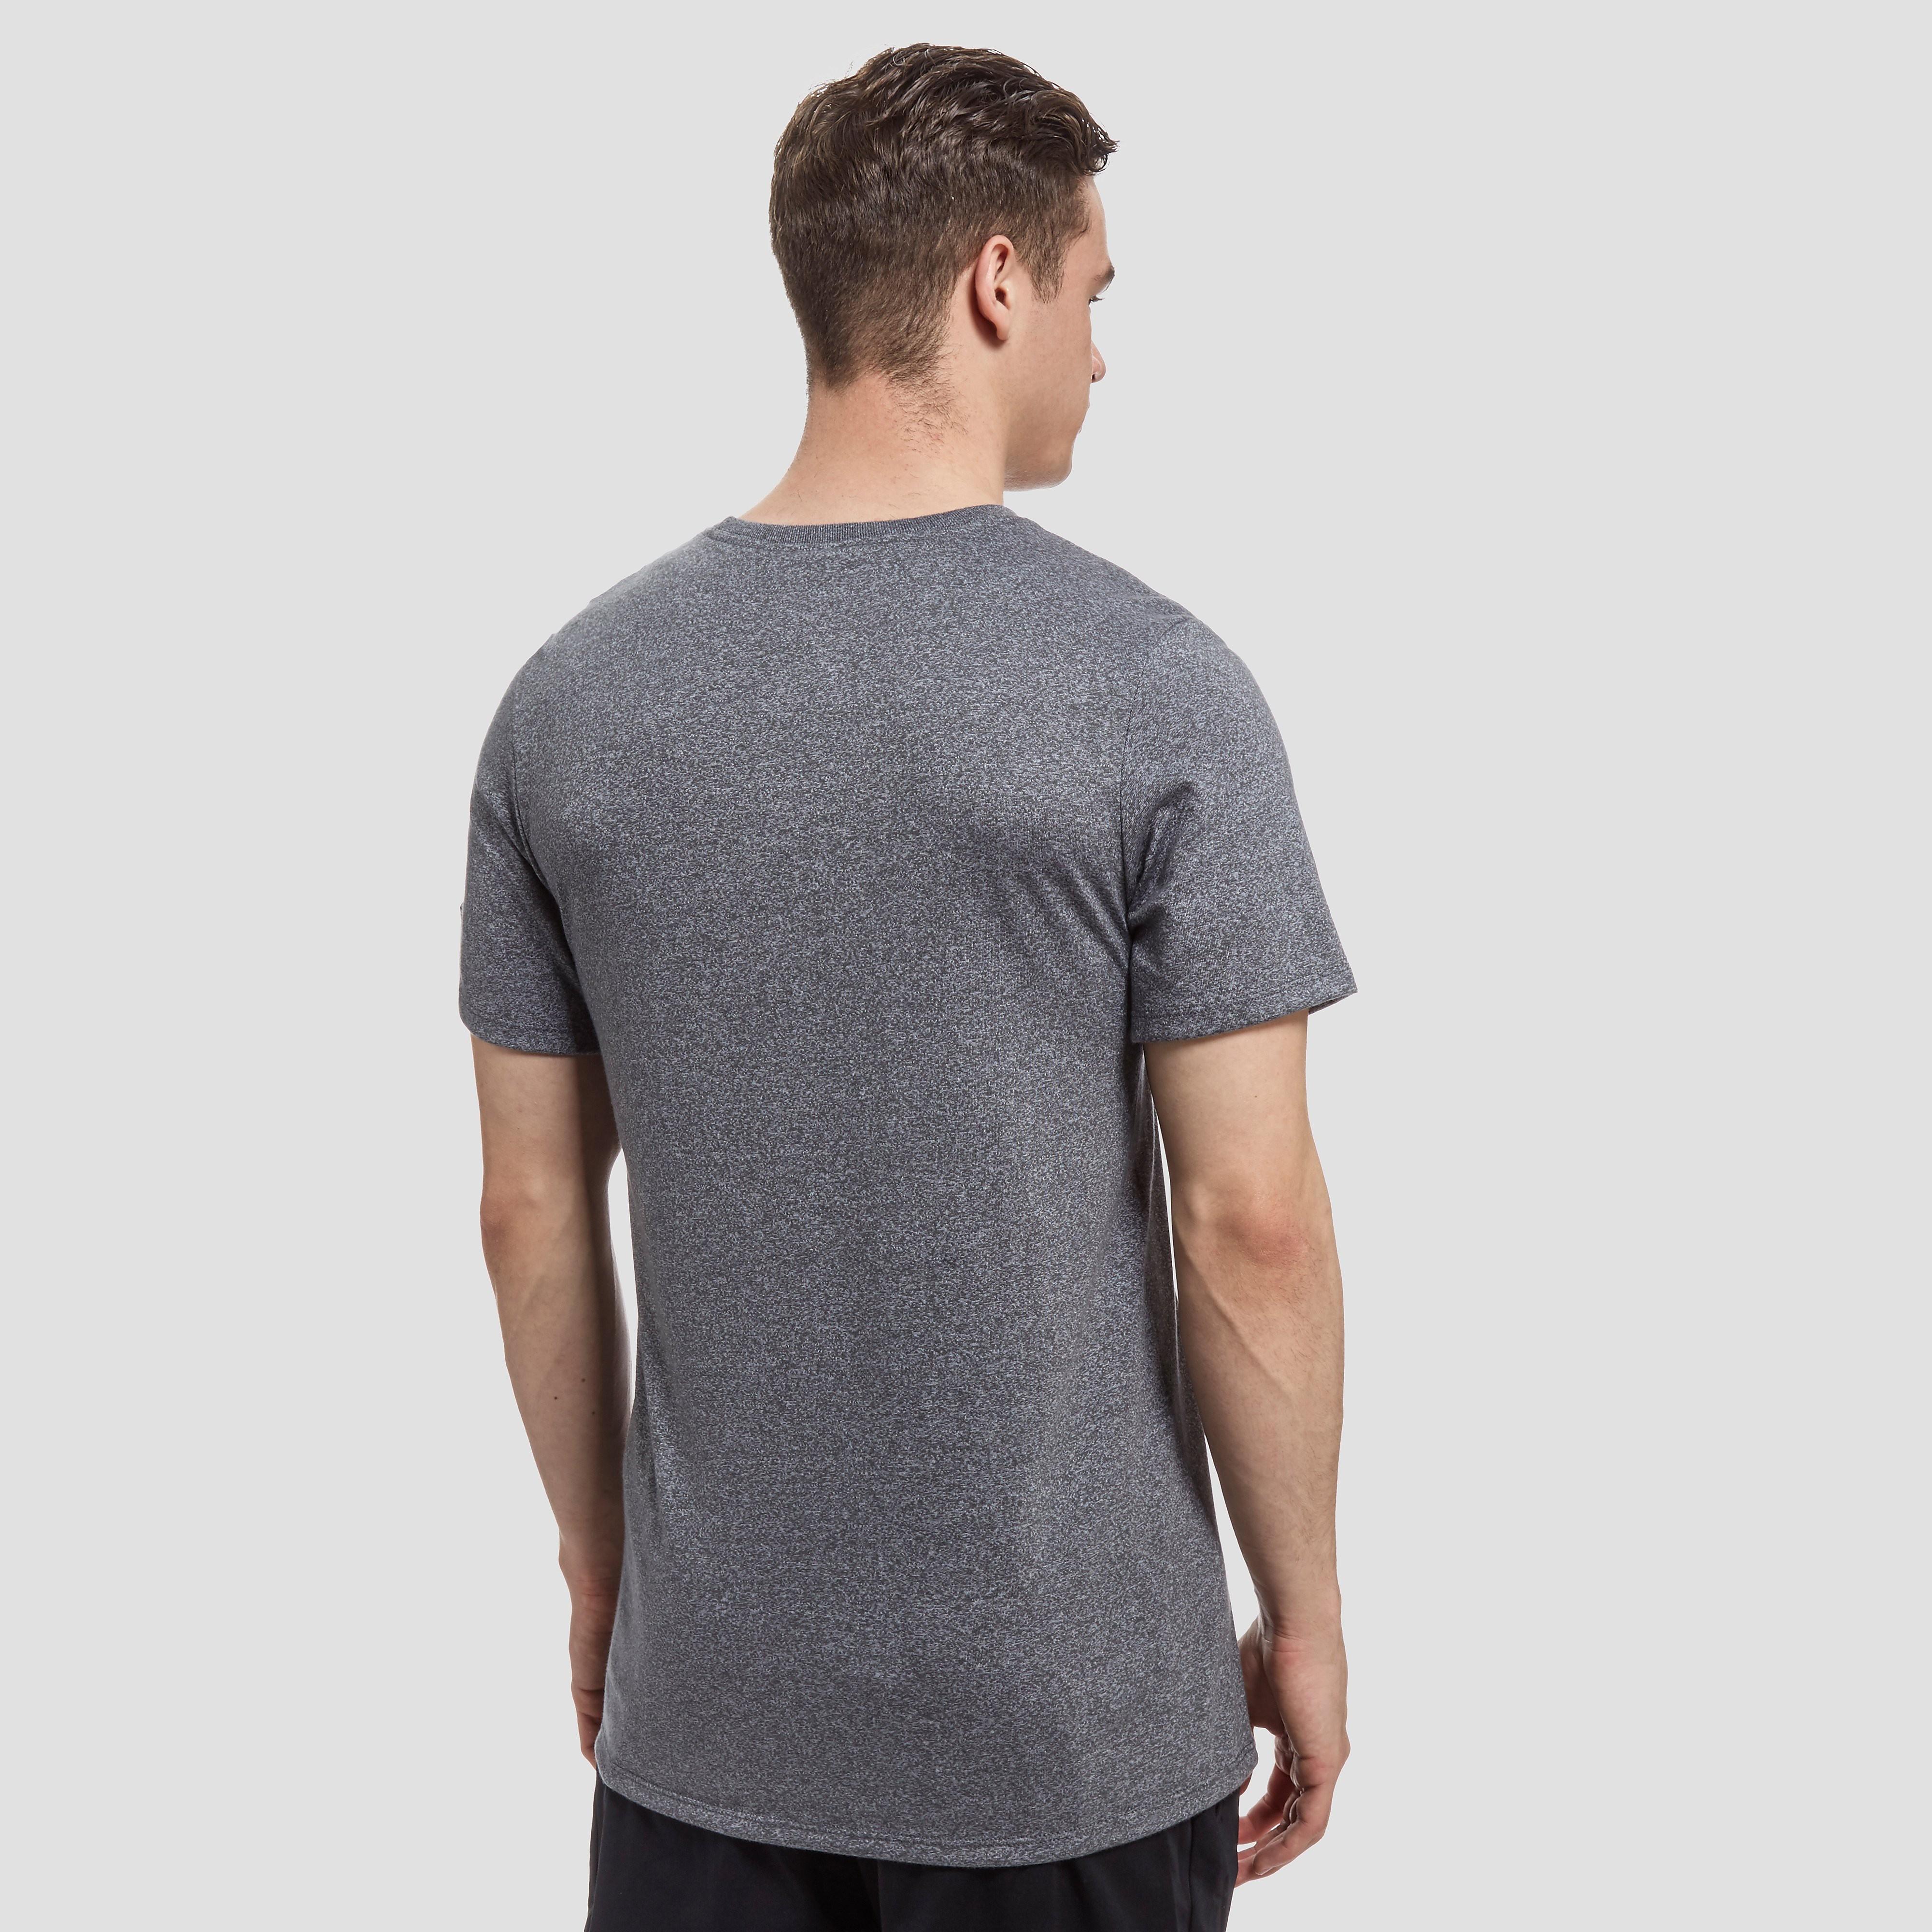 Nike NFL Jacksonville Jaguars Men's T-Shirt